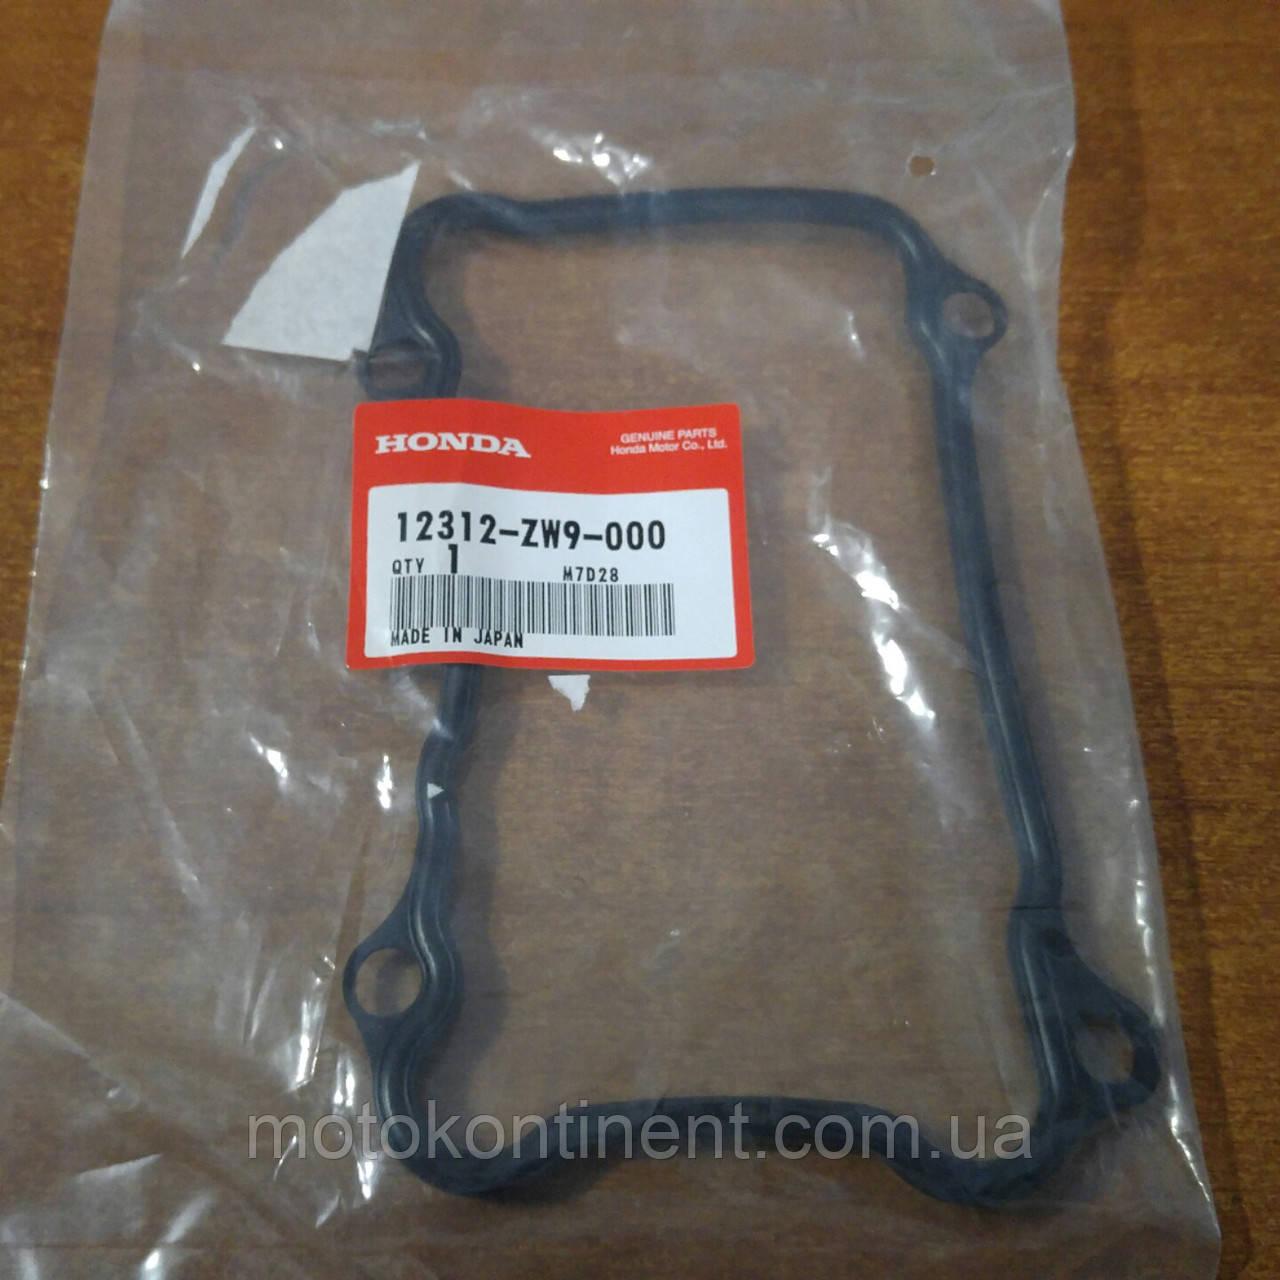 12312-ZW9-000 Прокладка крышки головки цилиндра Honda BF8/BF10/BF15/BF20